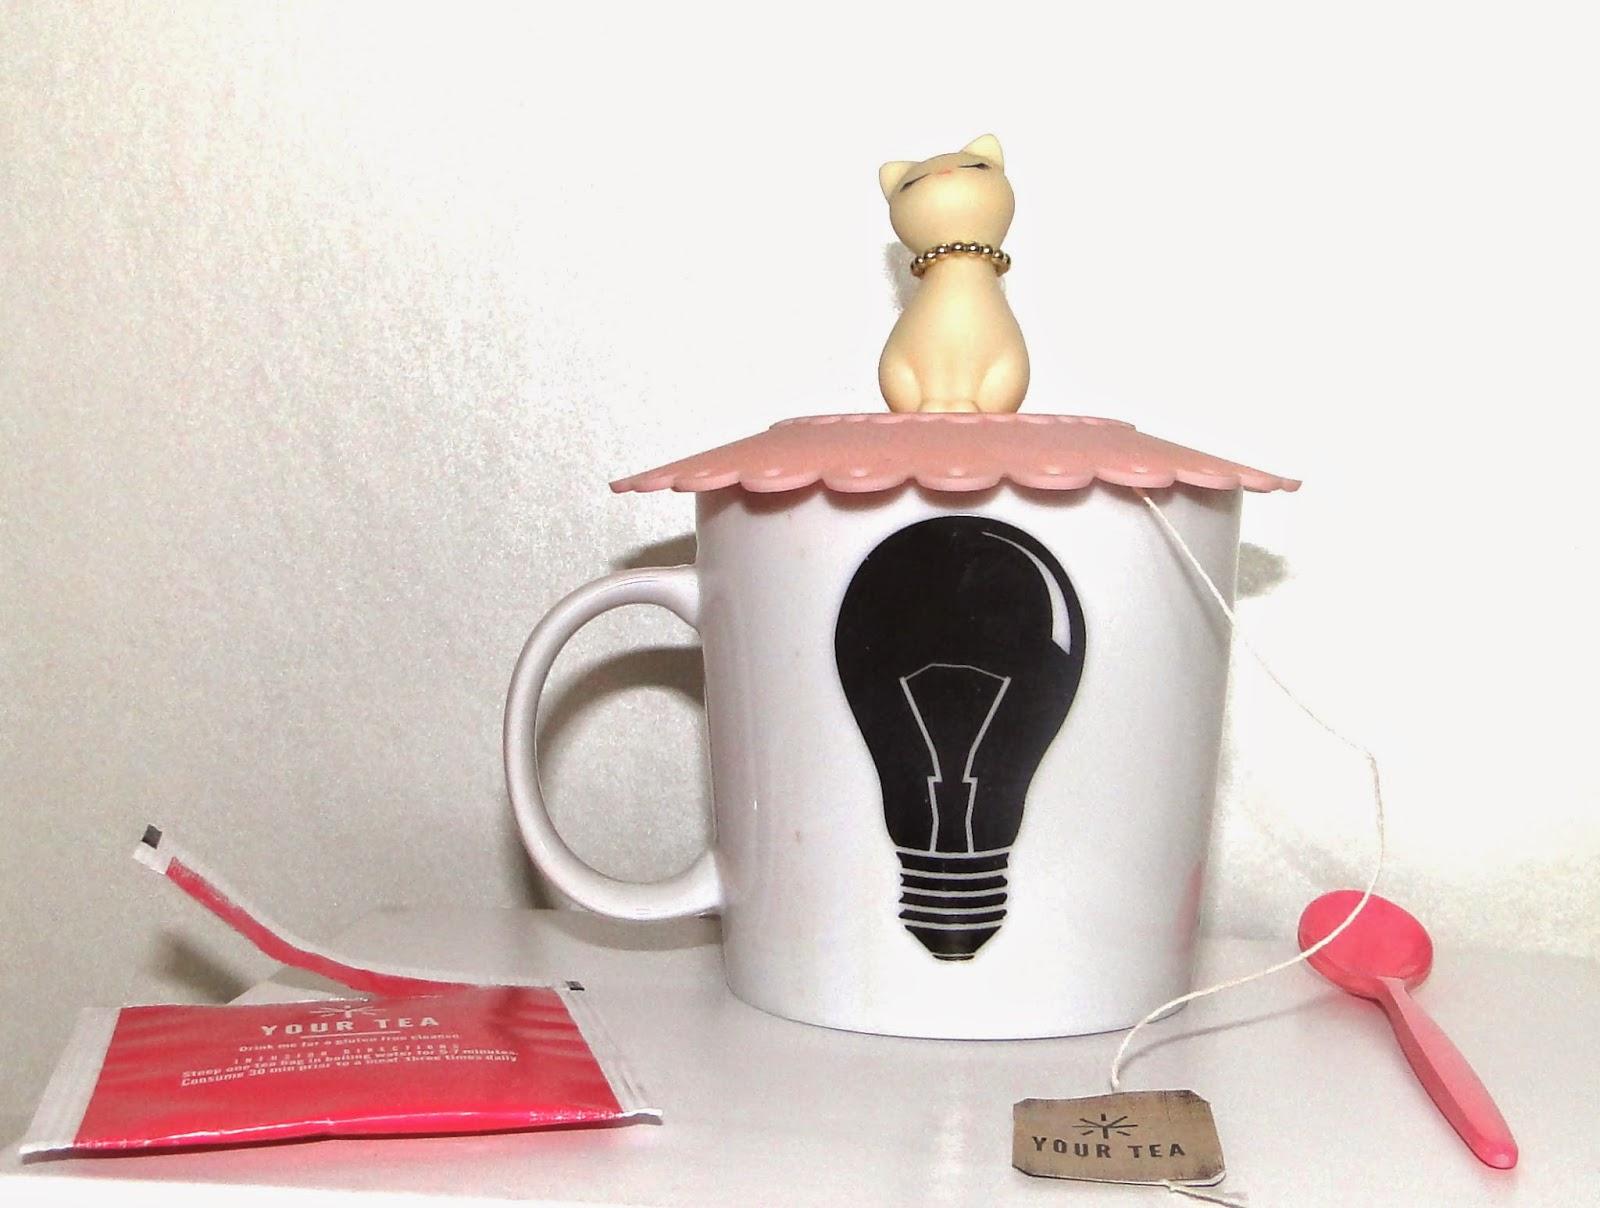 Tiny Tea, B Slim, Thé minceur, maigrir, thé